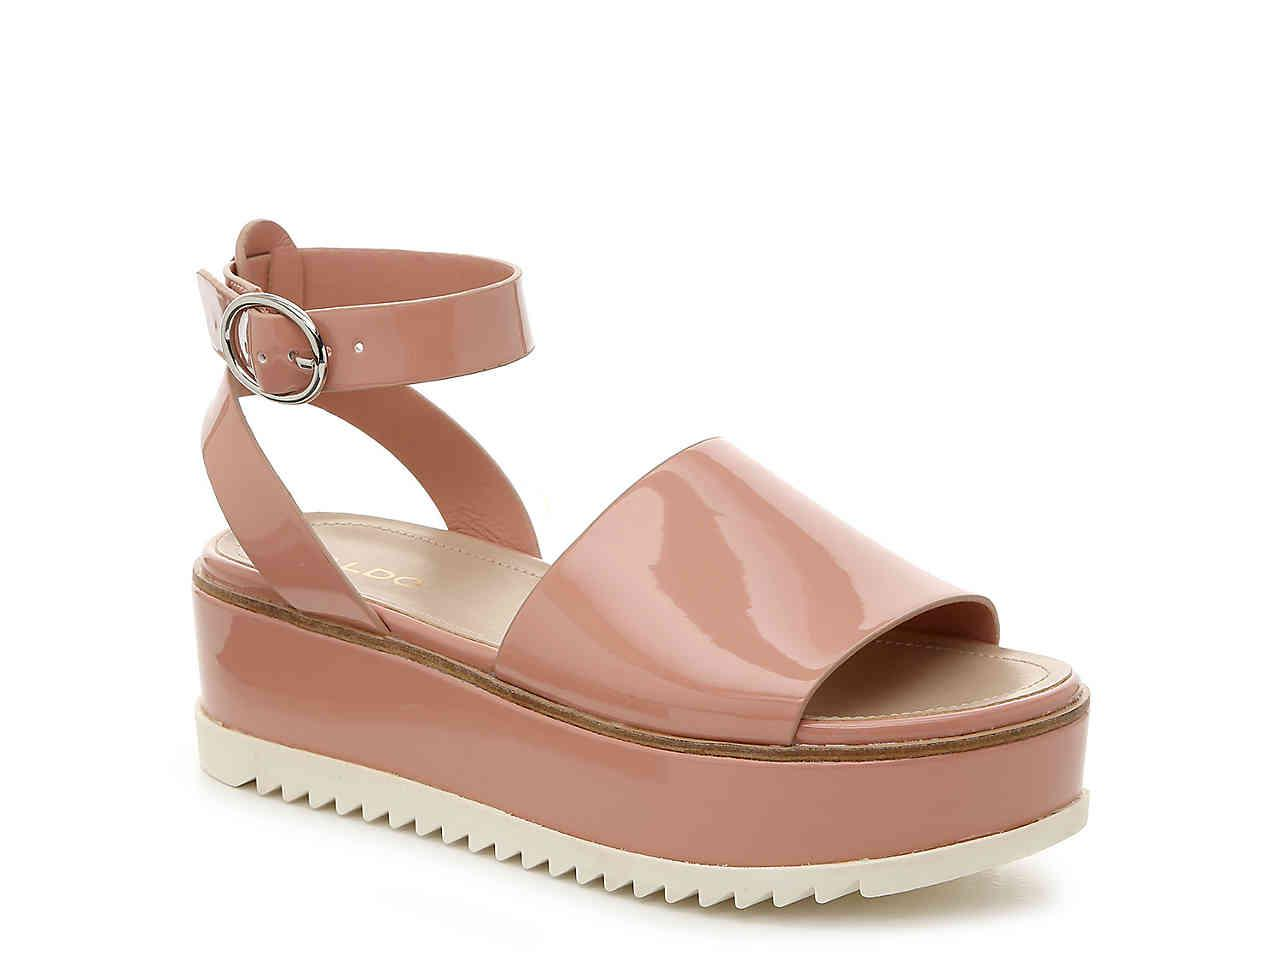 bf3b596a449 ALDO - Pink Jadde Platform Sandal - Lyst. View fullscreen